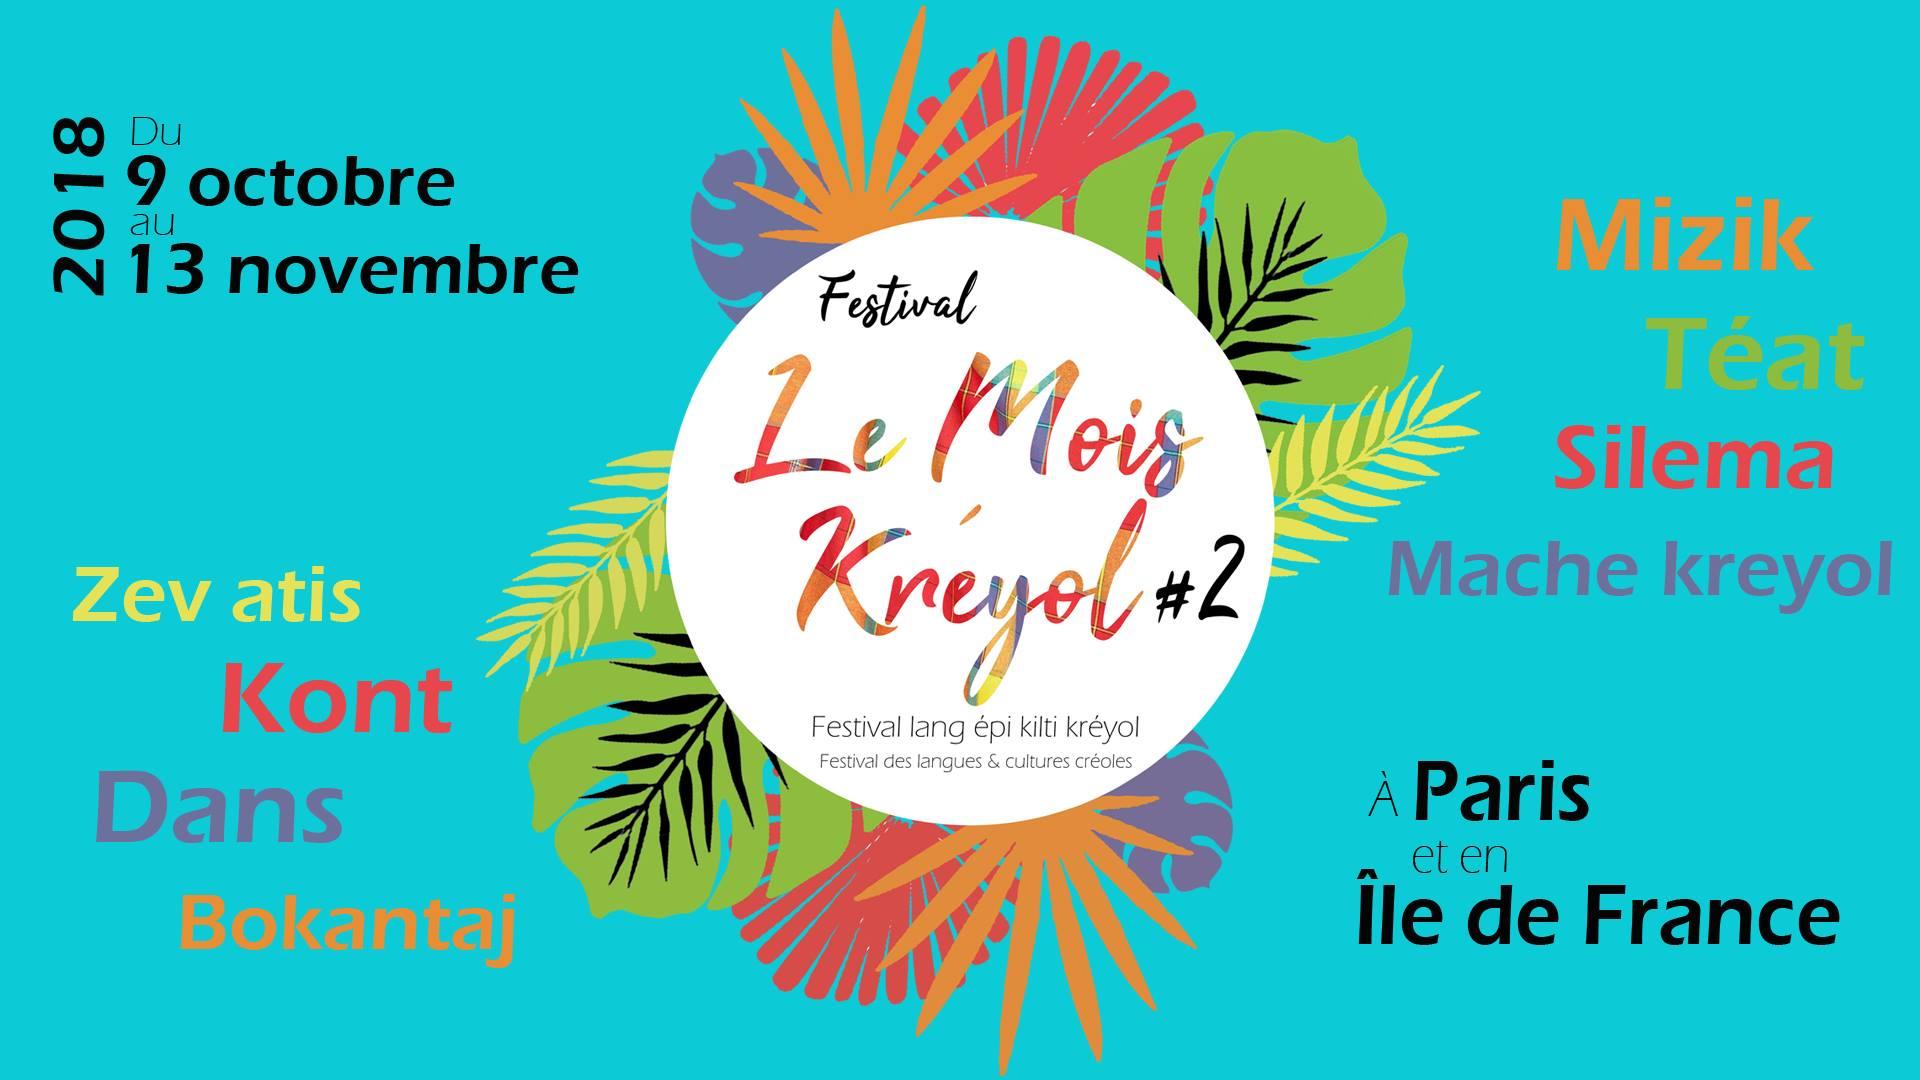 Le «Mois Kreyol » 2018 : festival lang épi kilti kreyol